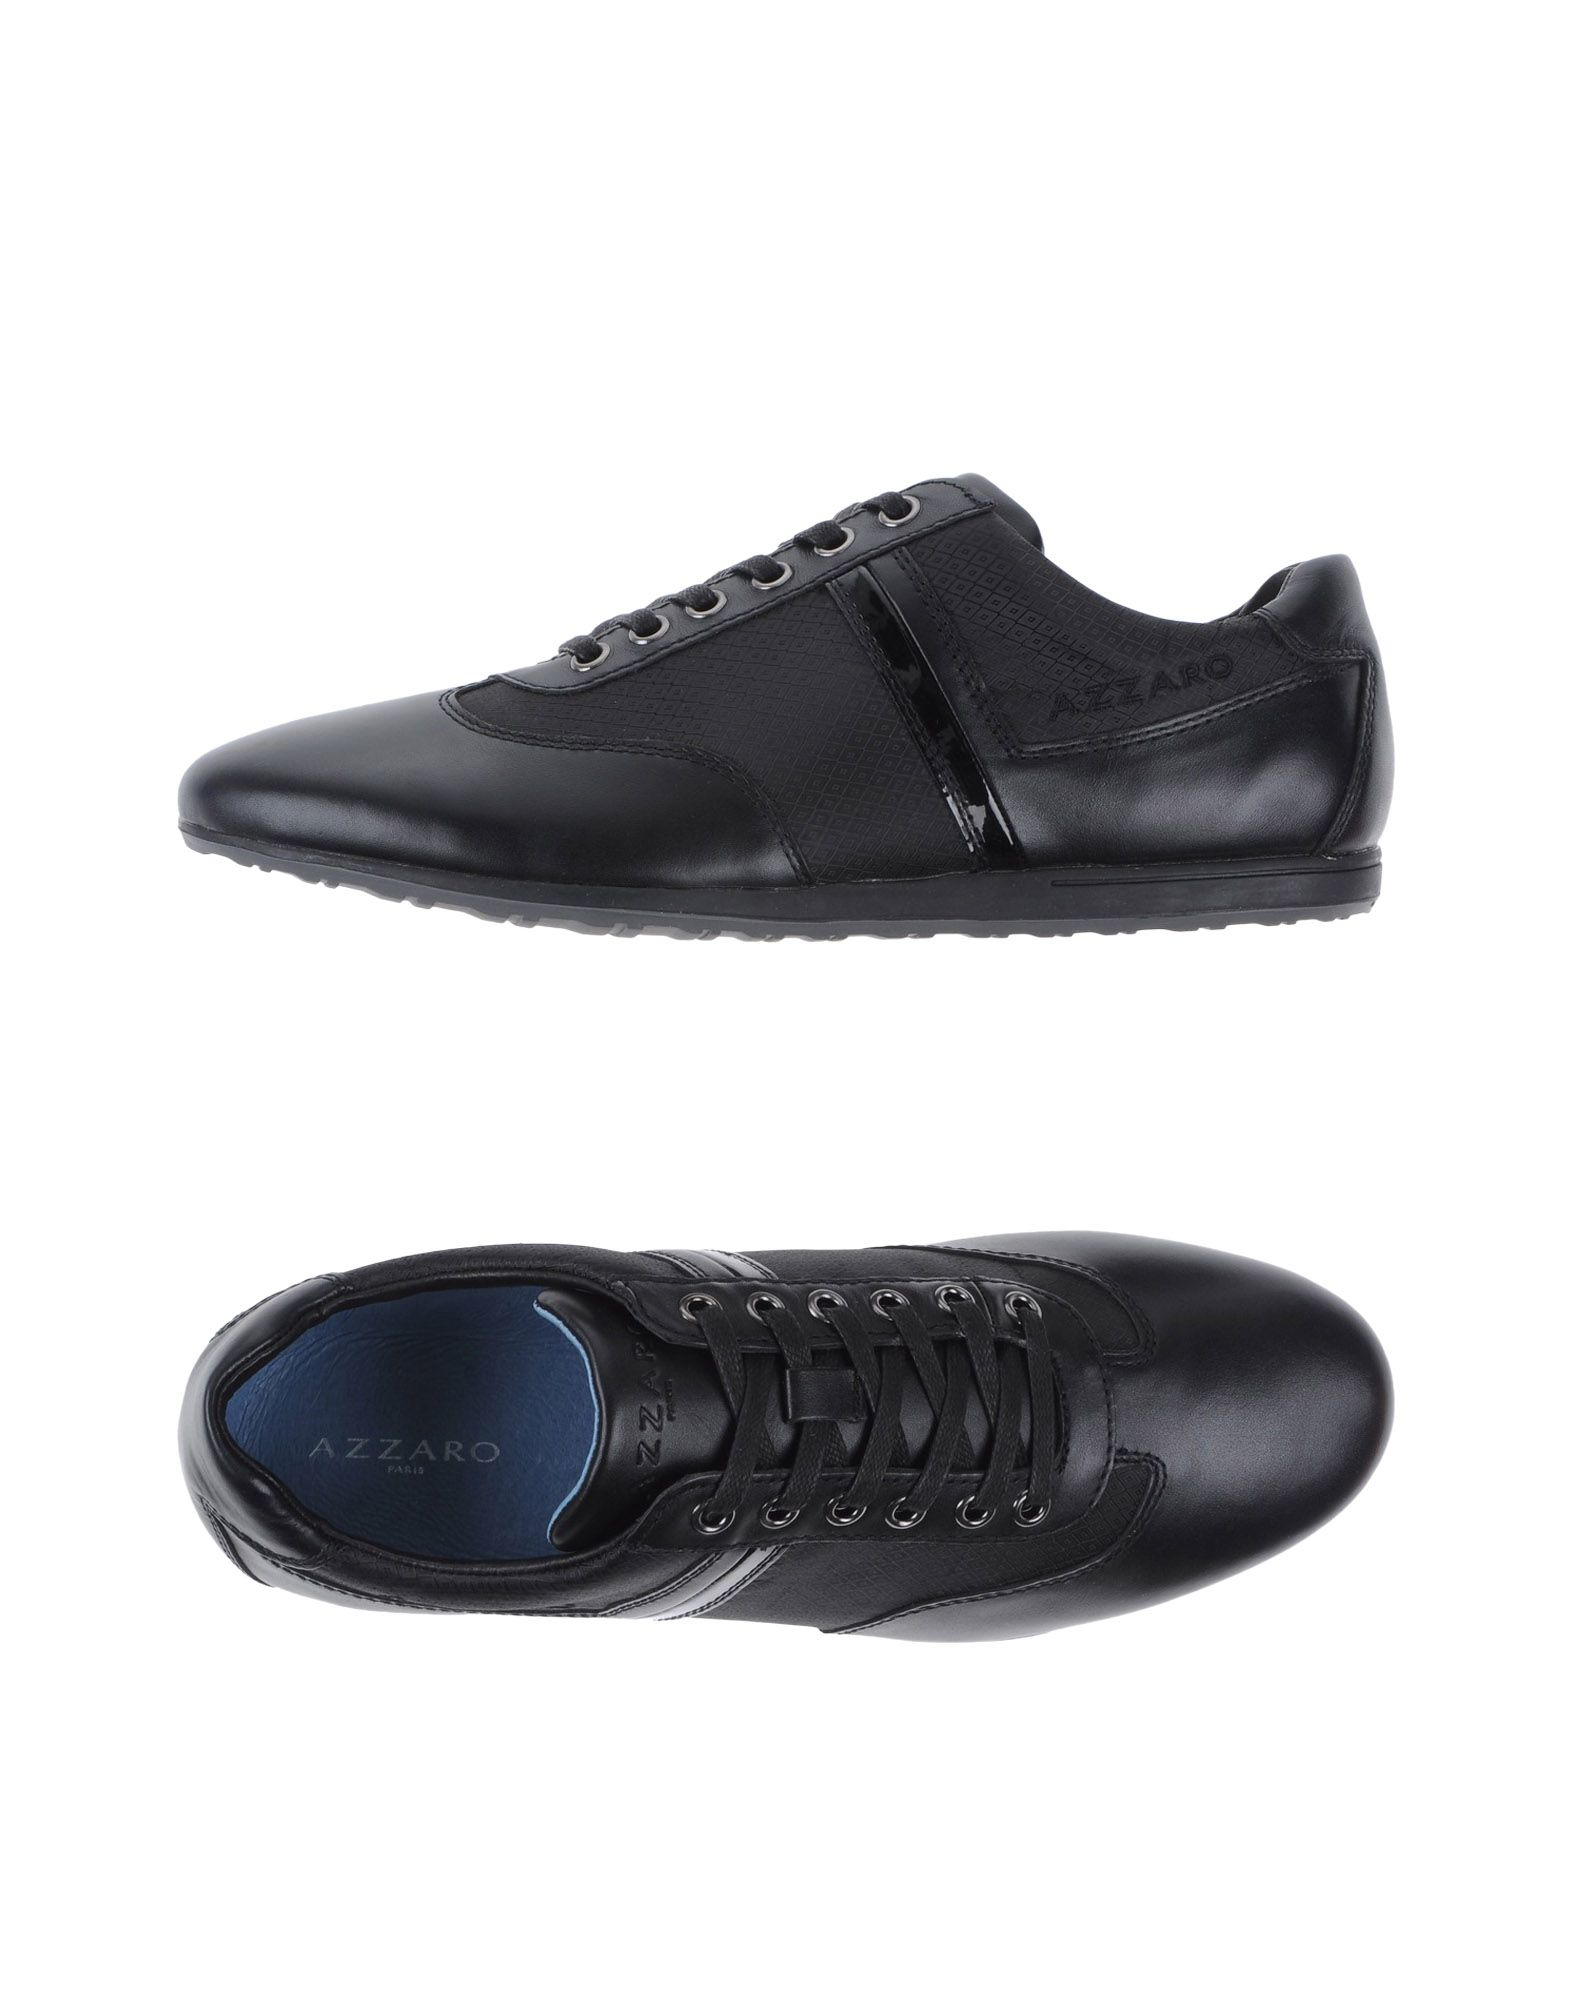 Azzaro Black Shoes